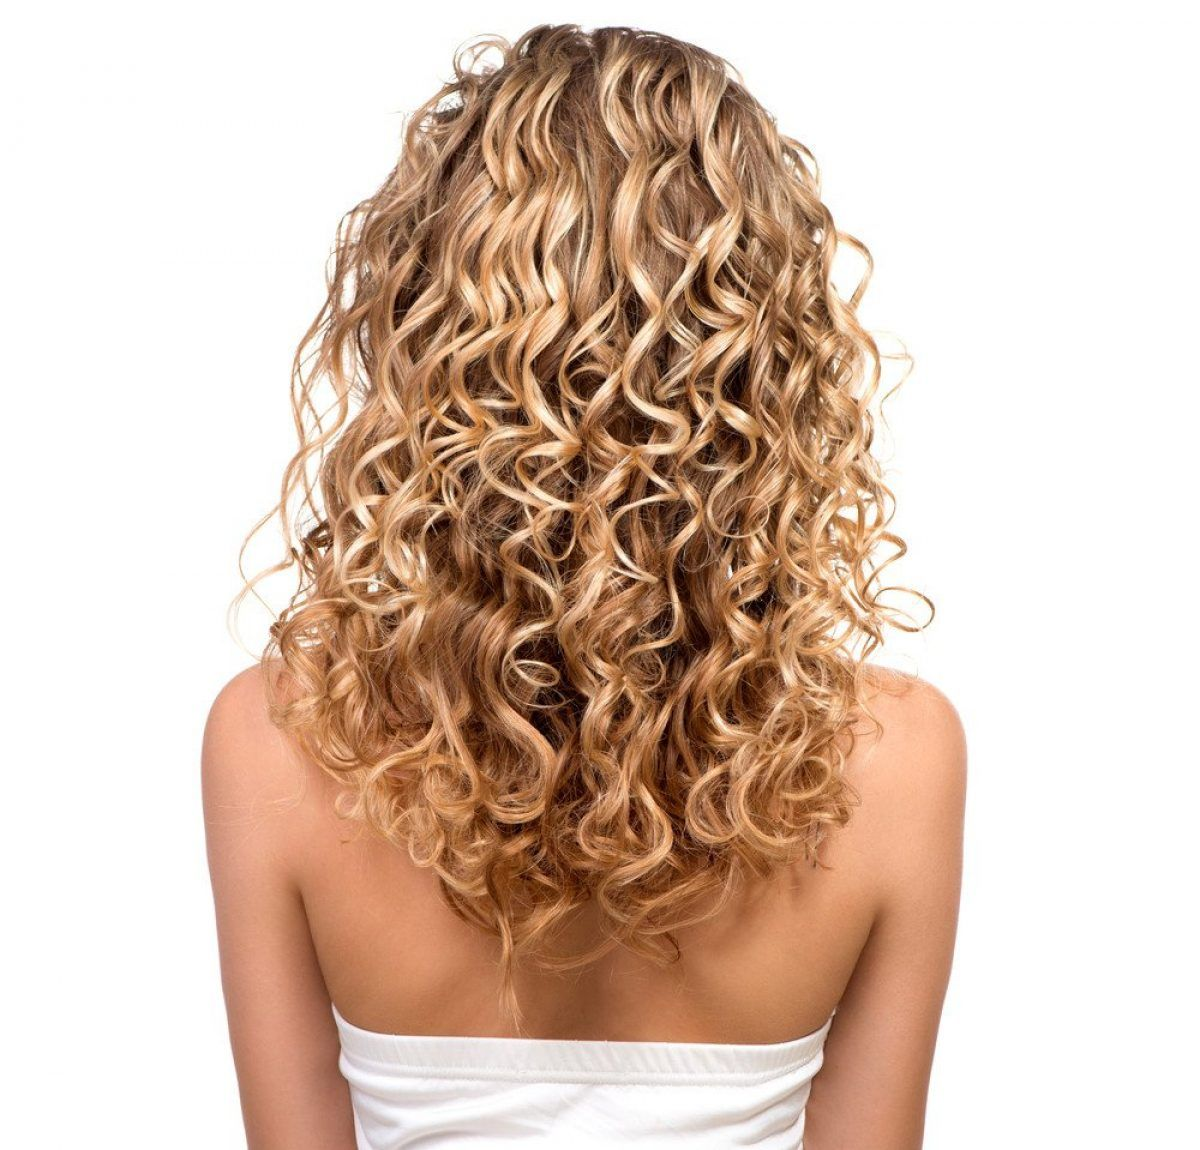 Https Www Frisuren Magazin De Wp Content Uploads 2015 06 Dauerwelle Locken Ratgeber Tipps 1200x1150 Jpg In 2020 Long Hair Perm Permed Hairstyles Hair Diffuser